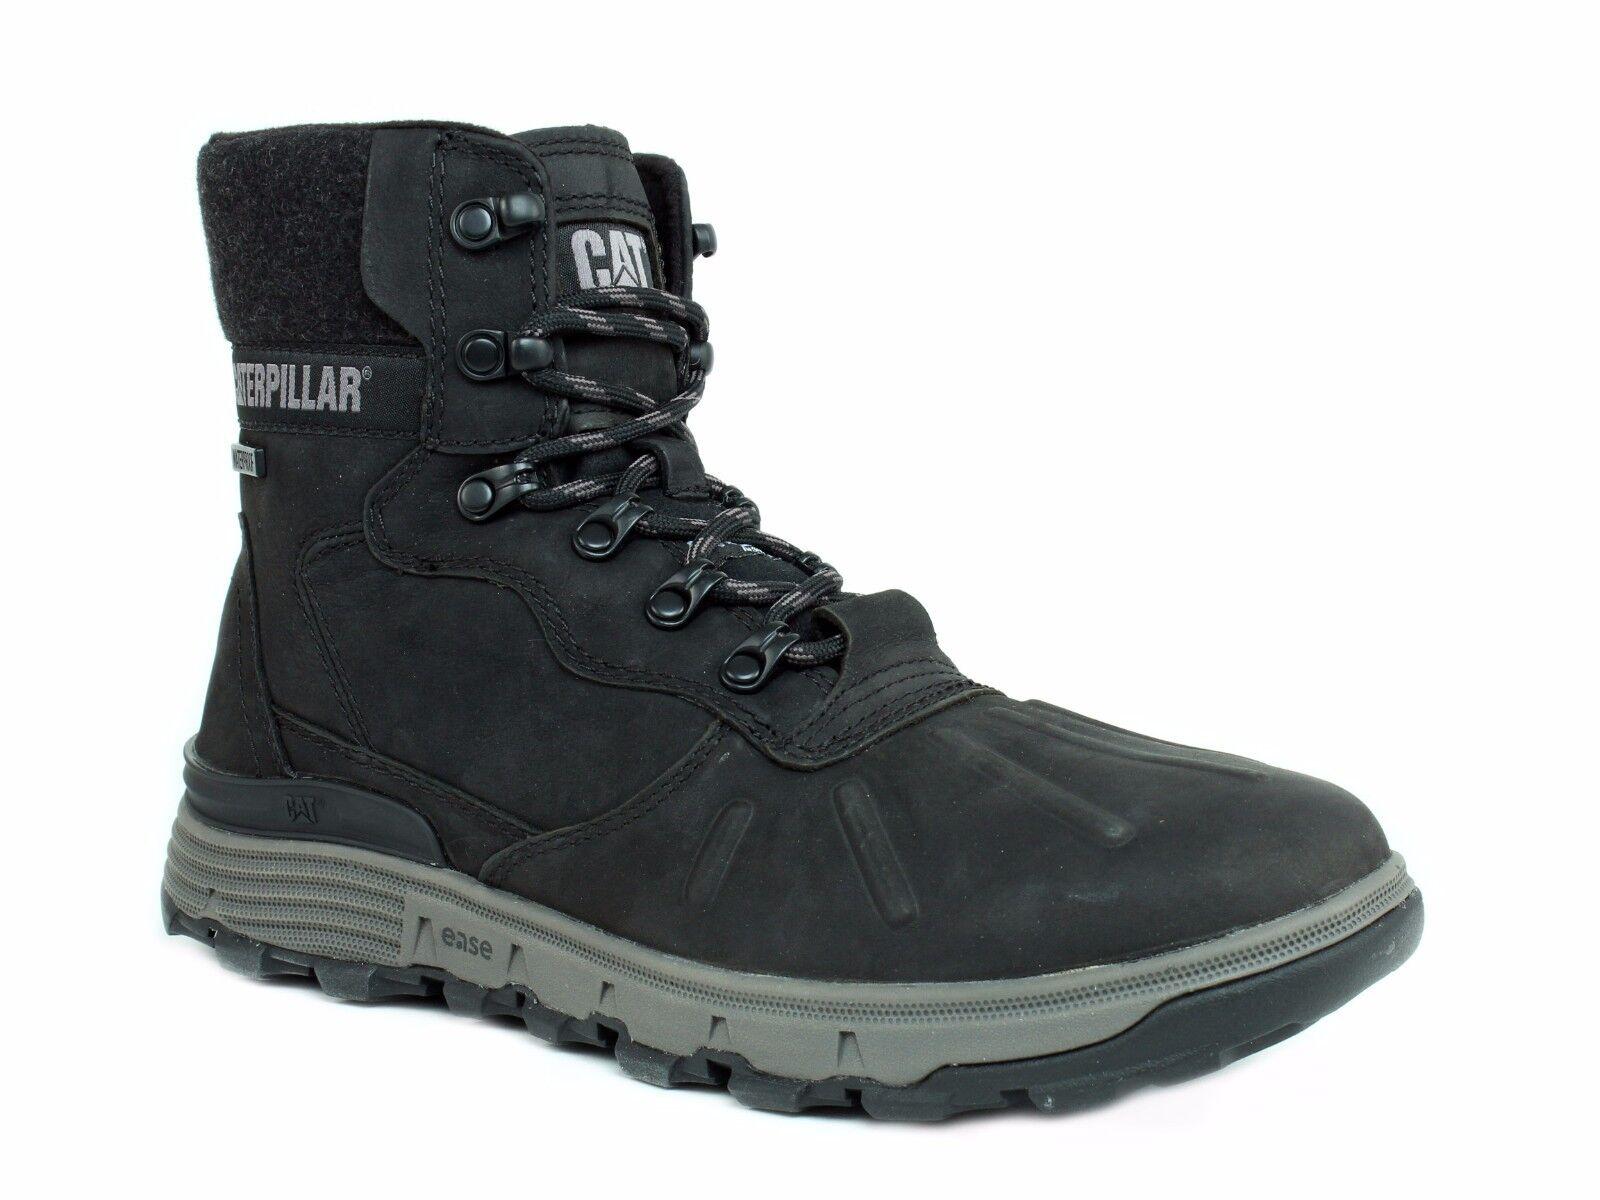 Caterpillar STICTION Hi ICE + W Impermeable Aislado botas De Cuero Negro para Hombre